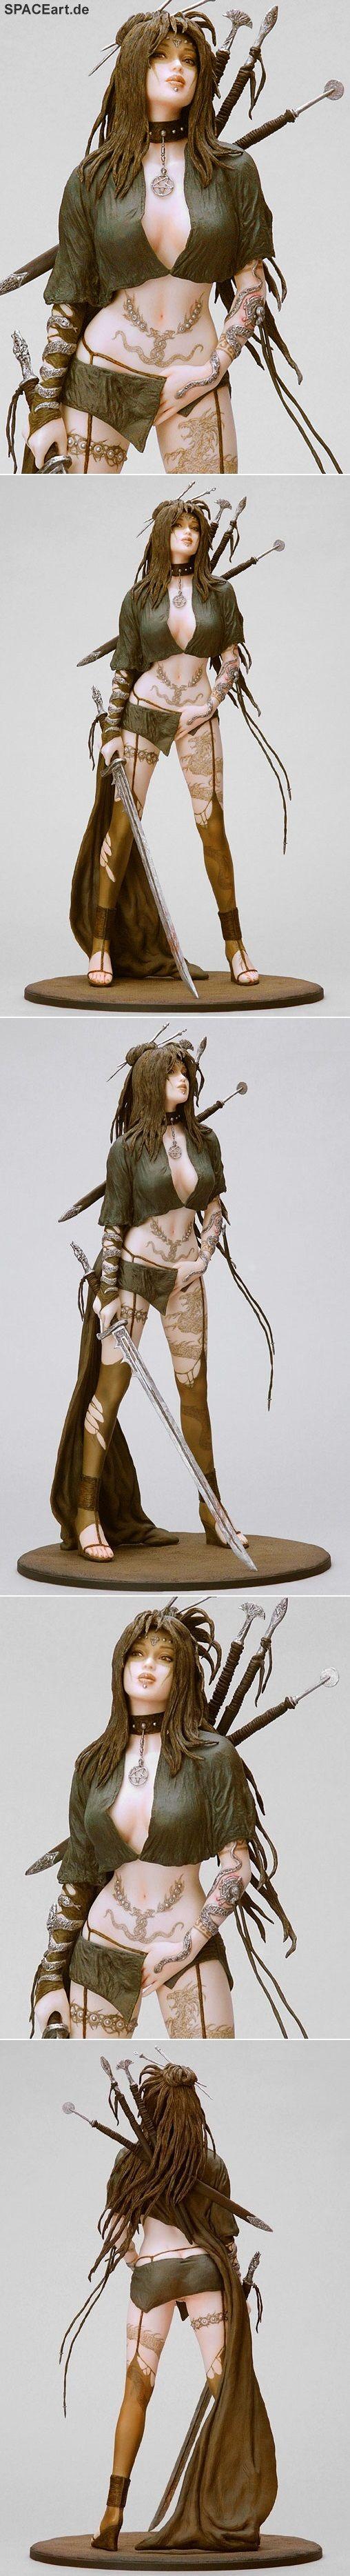 Luis Royo: Medusas Gaze